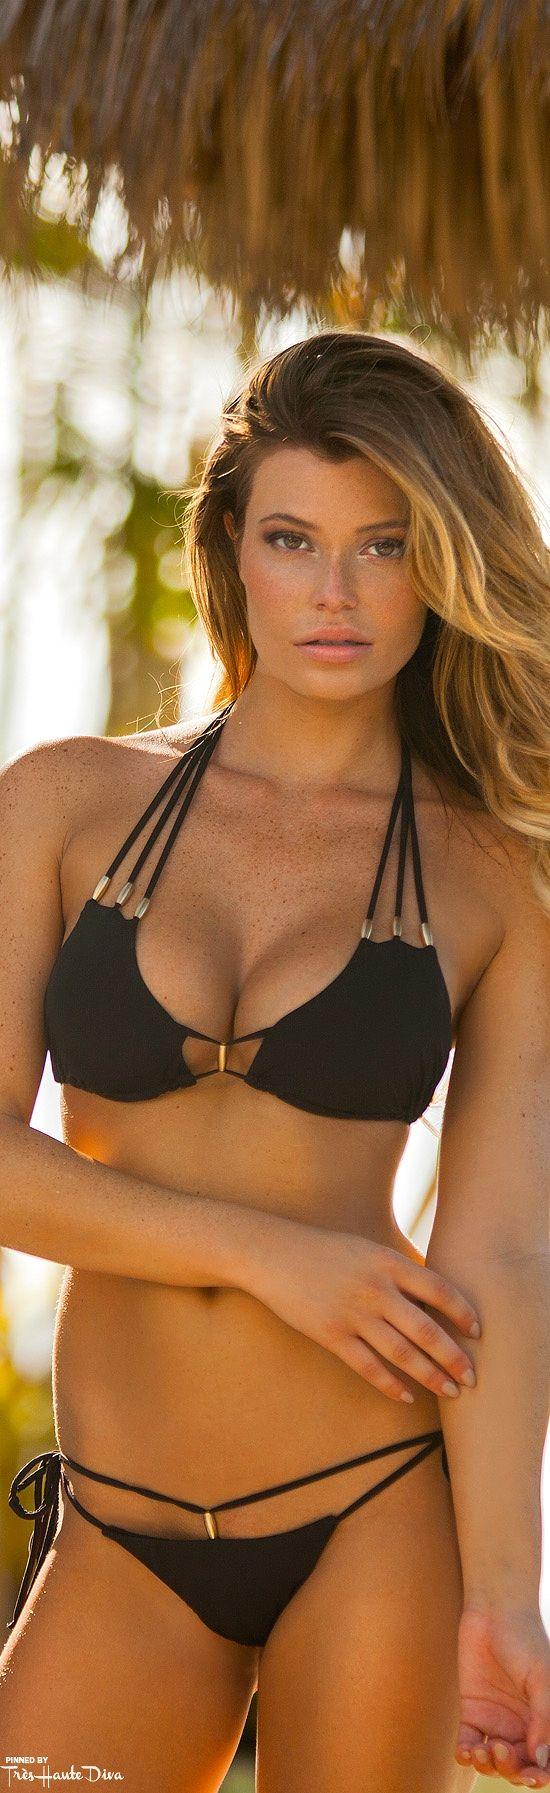 Très Haute Diva ♔ #Plumeria #Swimwear    Saba Bikini model: Samantha Hoopes